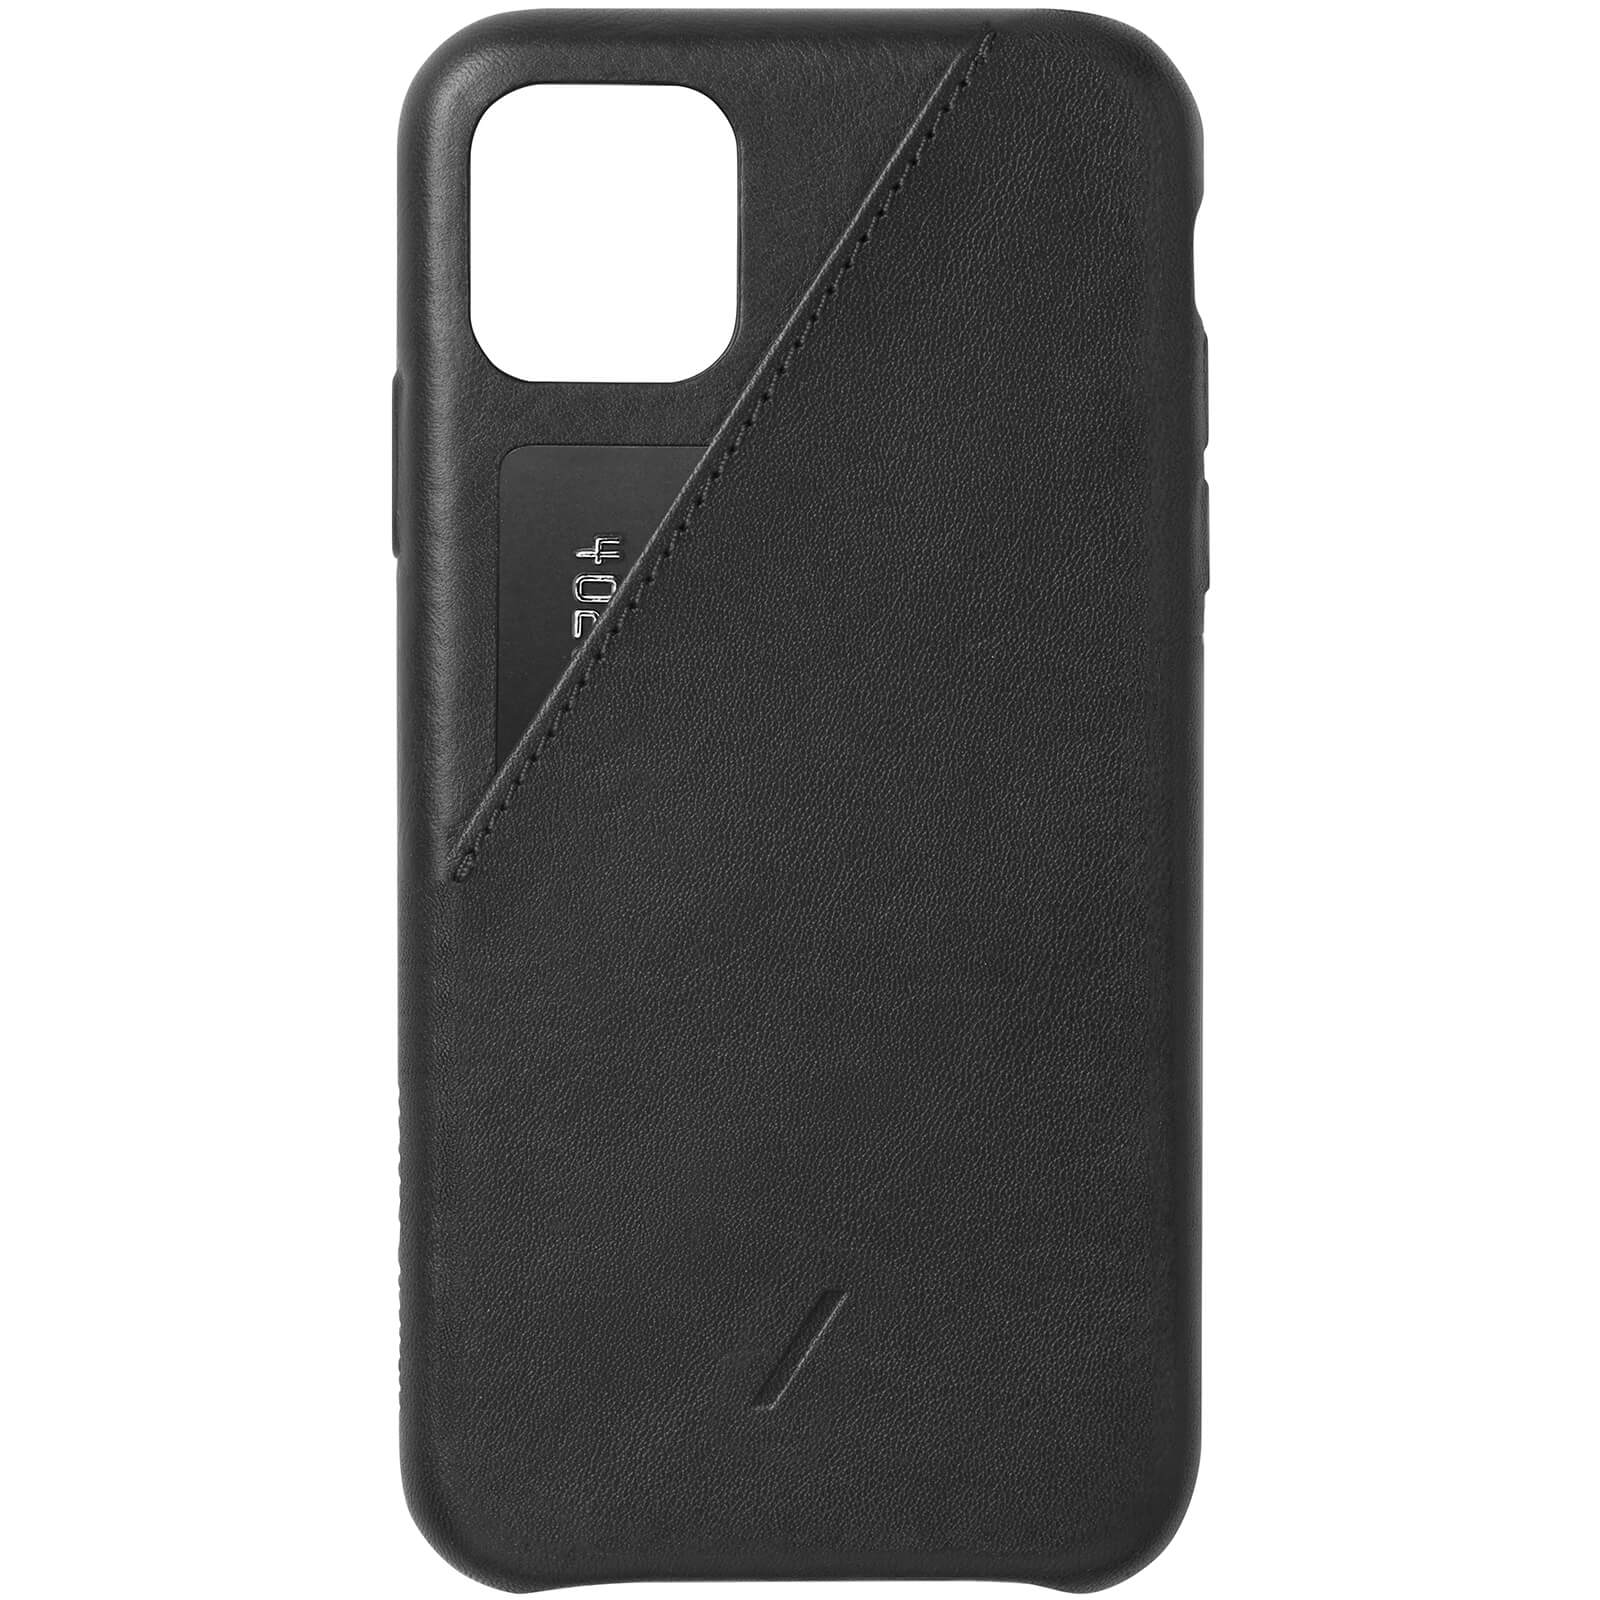 Native Union Clic Card iPhone Case - Black - iPhone 11